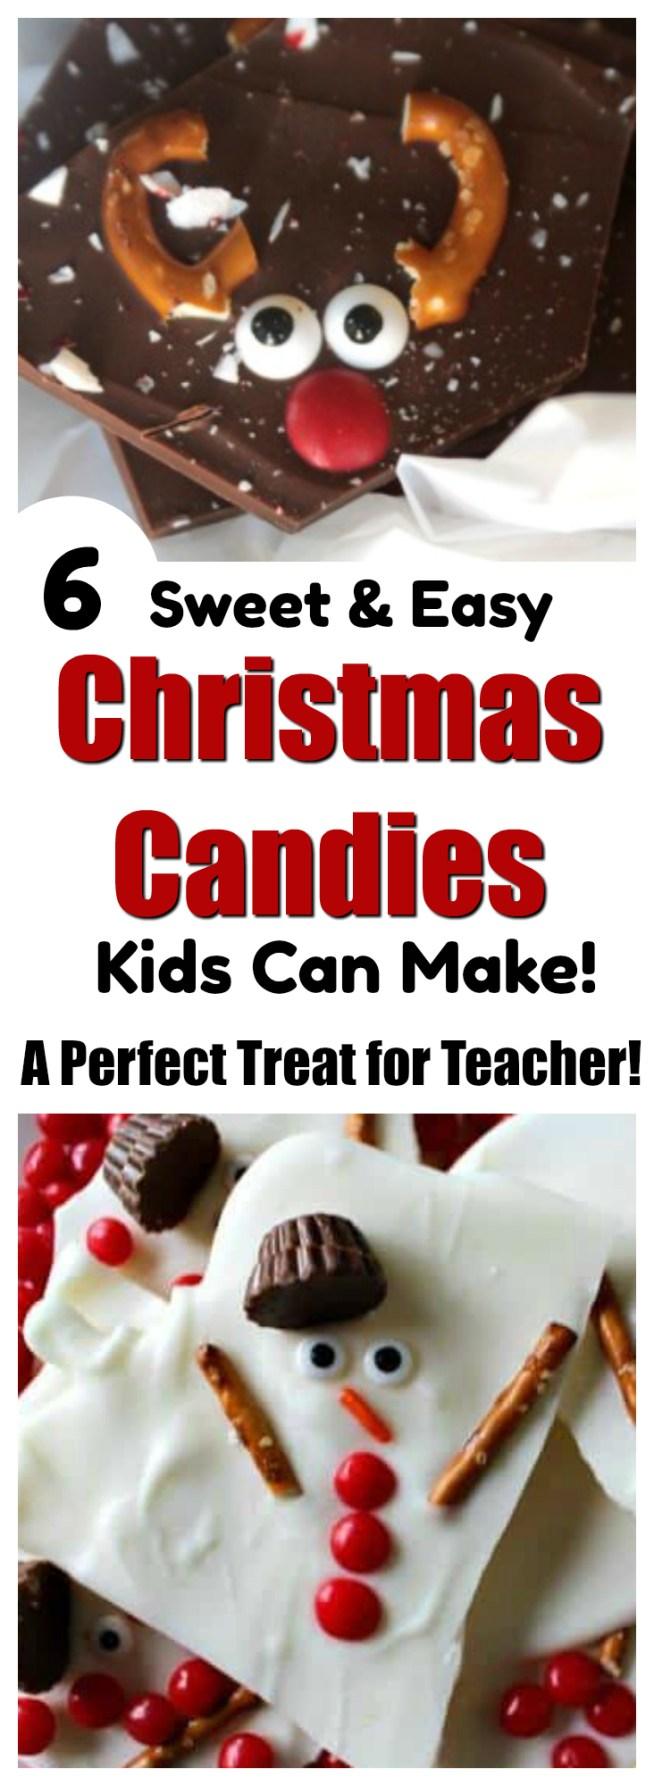 Sweet Treats For Teacher Christmas Candy Kids Can Make